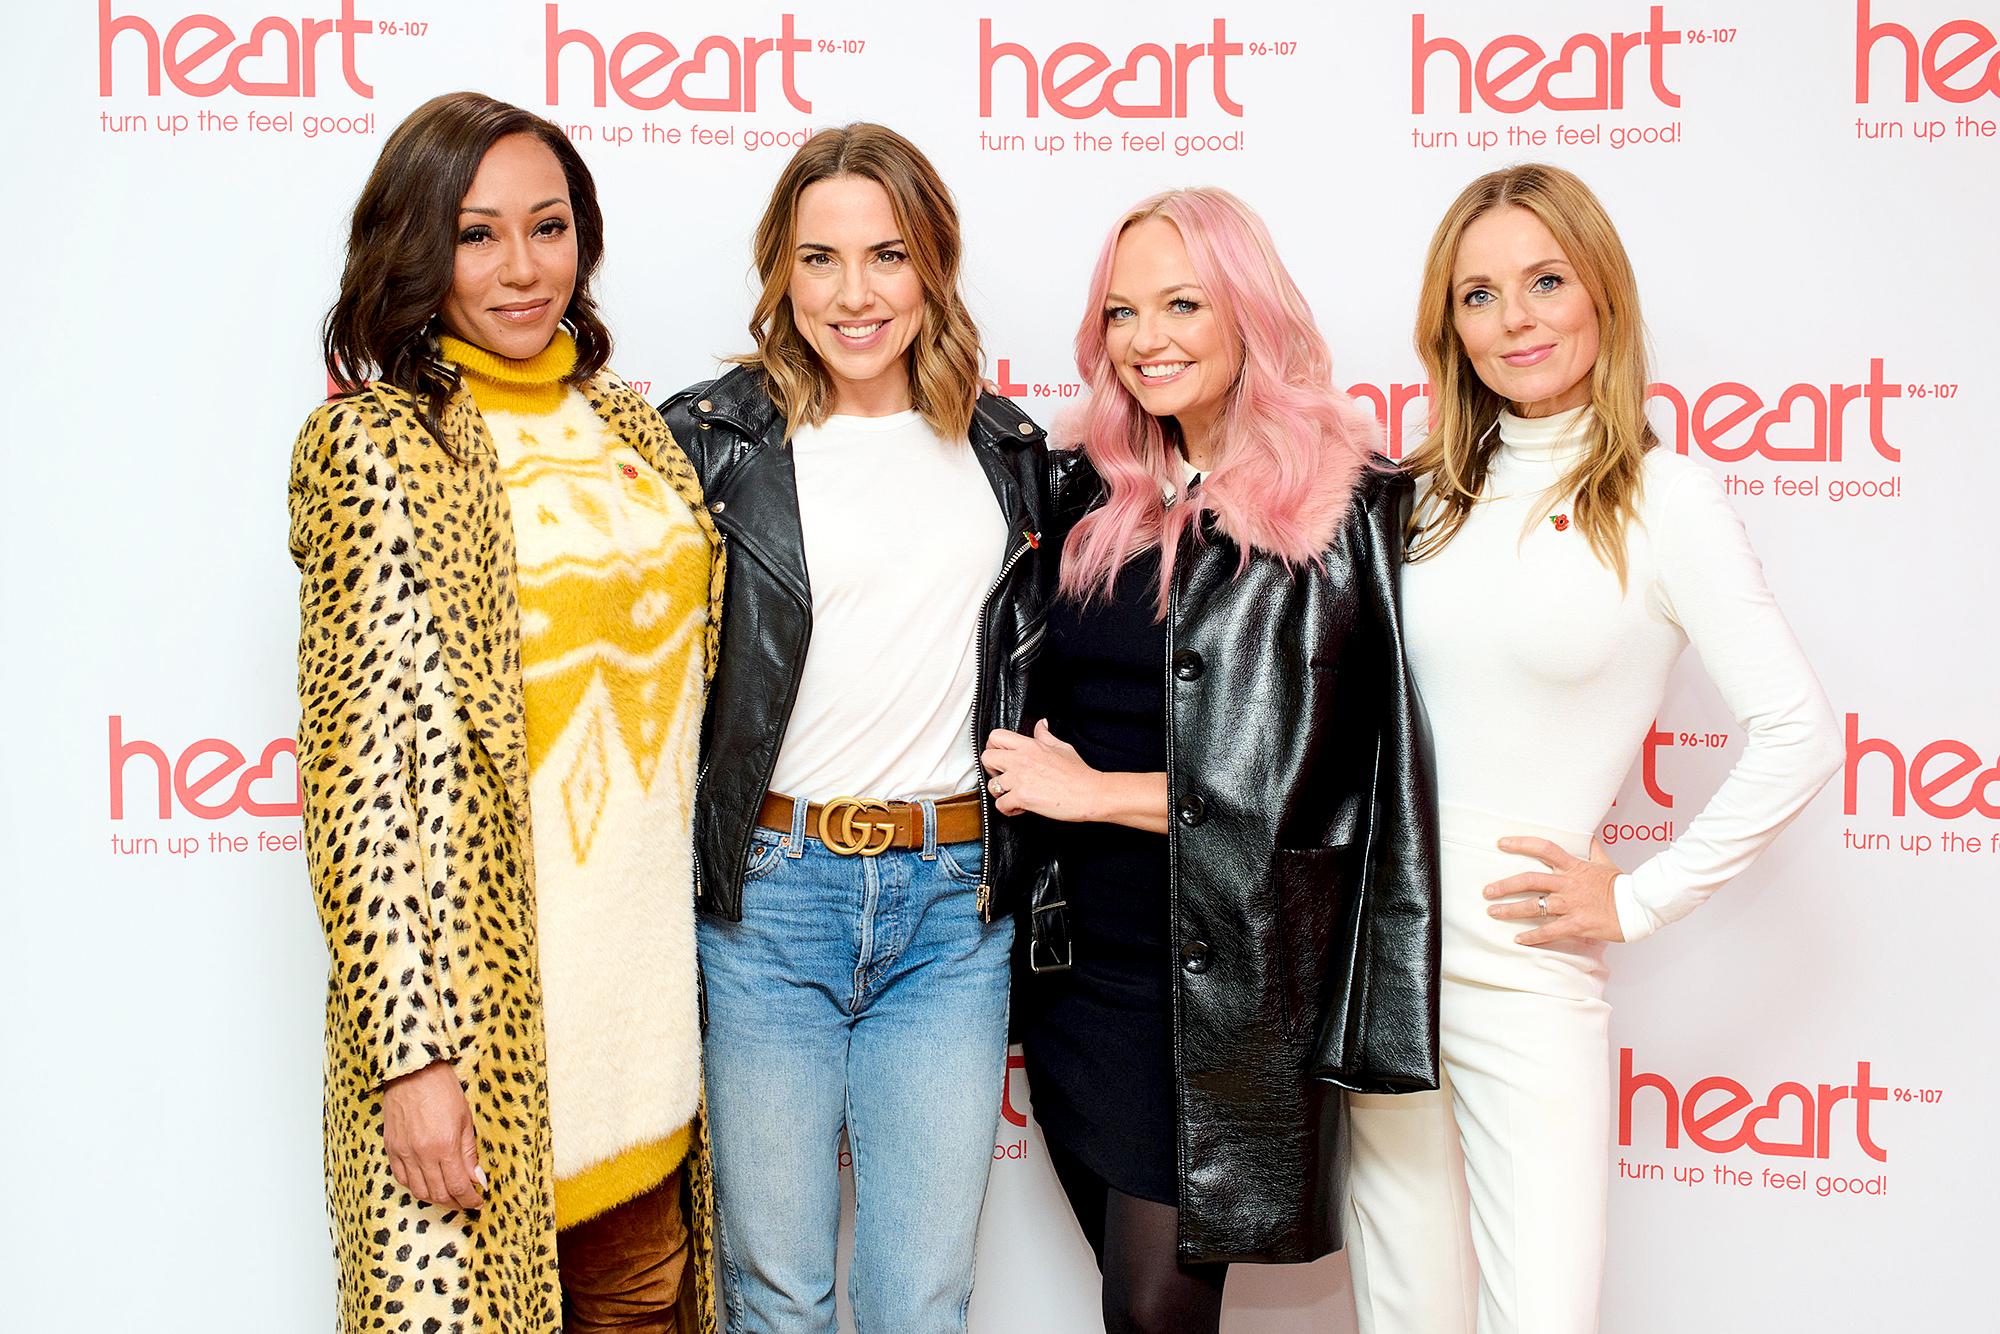 Melanie-Brown,-Melanie-Chisholm,-Geri-Horner,-Emma-Bunton-Spice-Girls